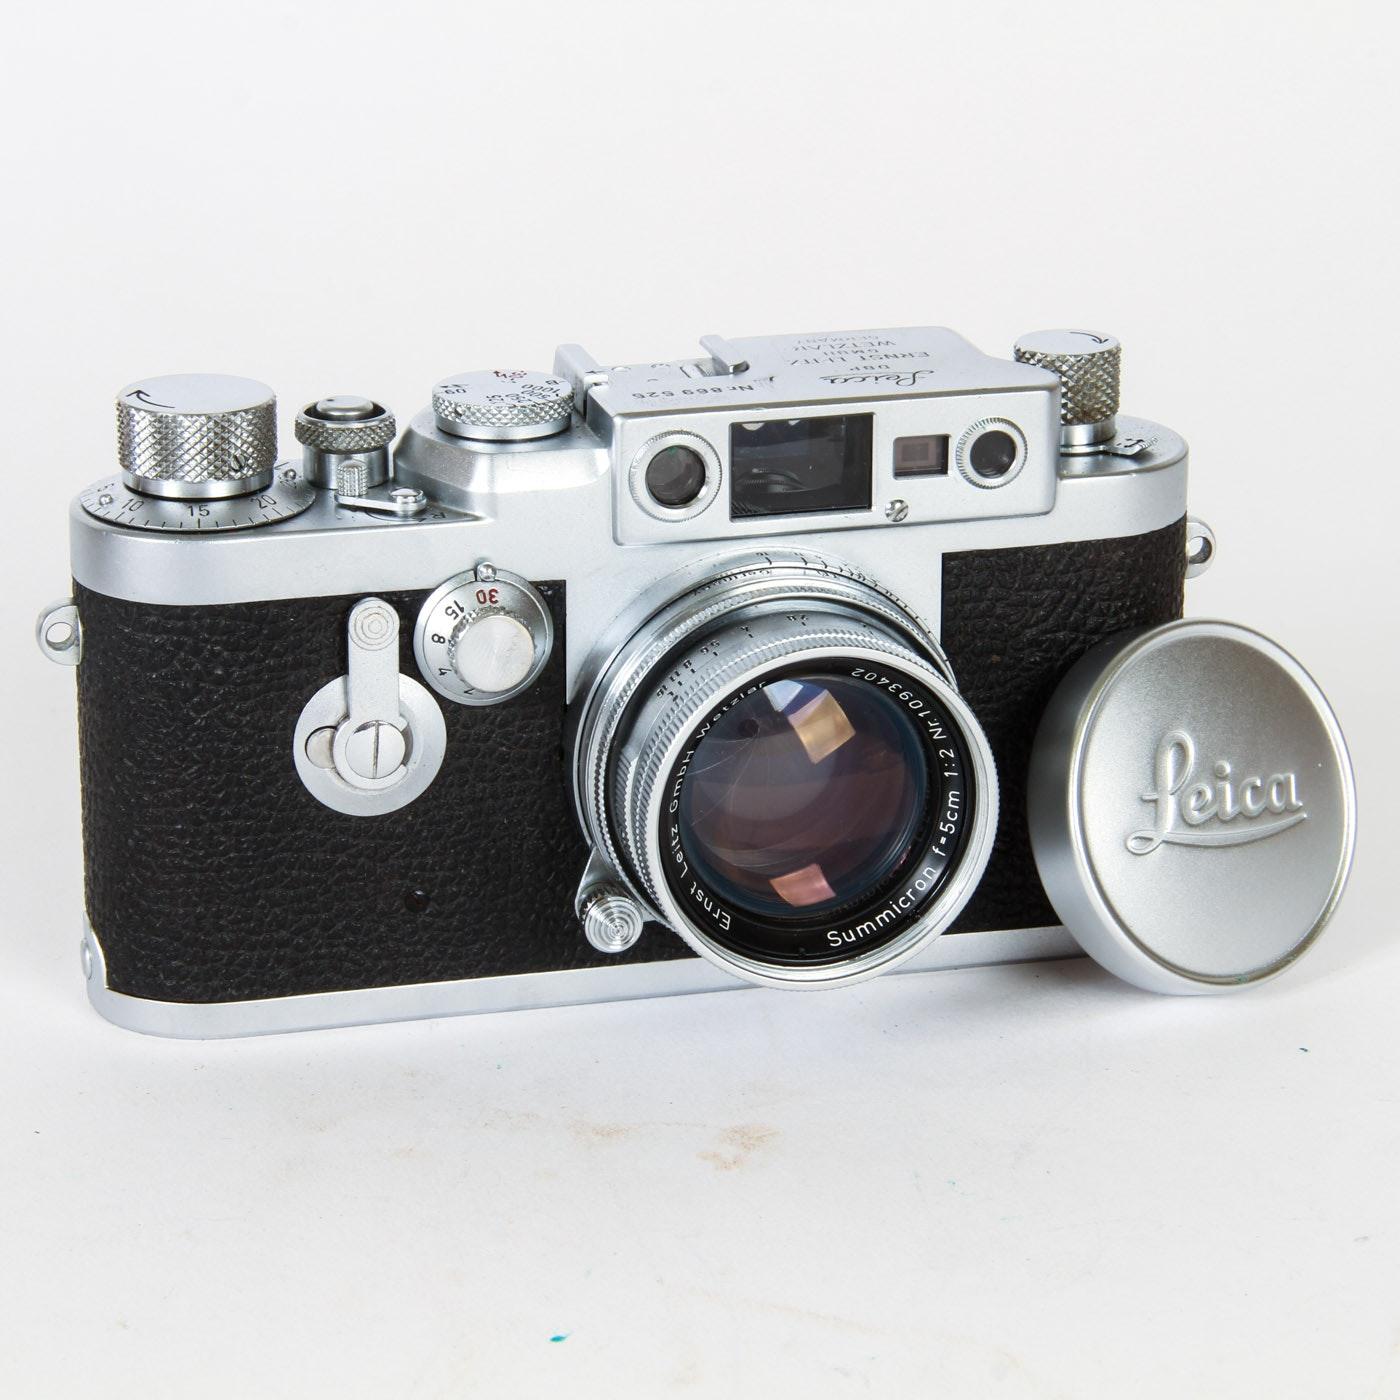 Vitnage Leica DBP Camera and Manual